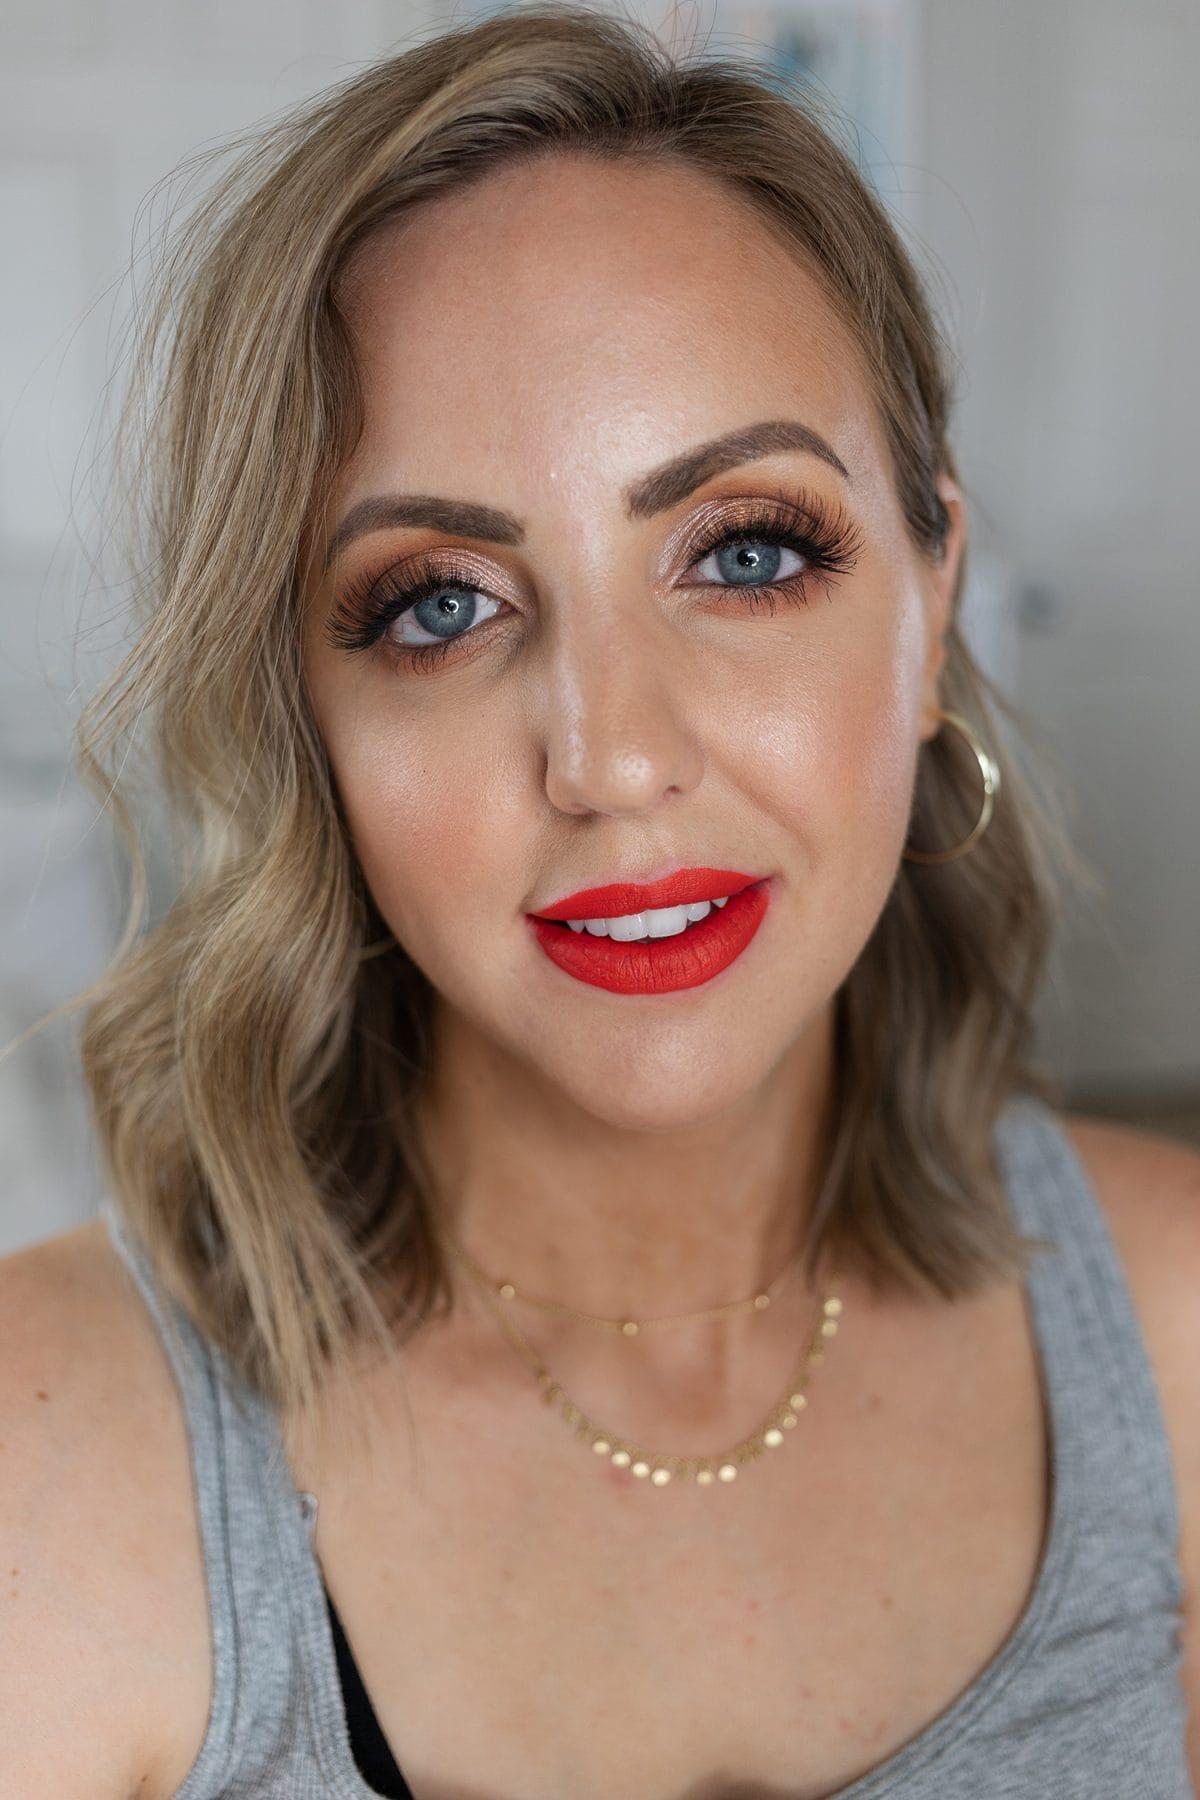 Houston beauty blogger Meg O. shares the best drugstore lip products for summer - Pixi MatteLast Liquid Lipstick in Orange Red